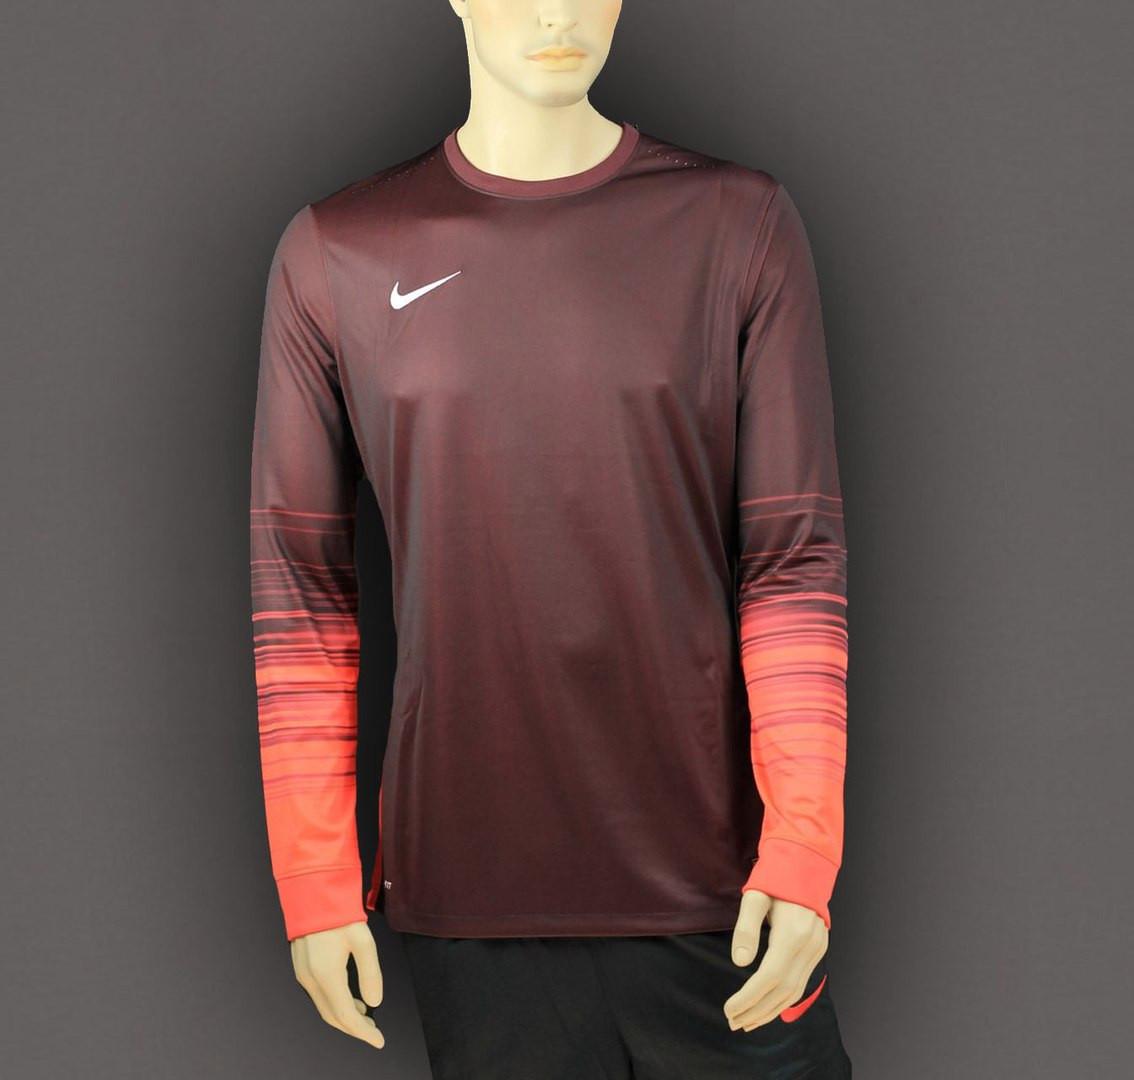 Футболки мужские TEAM-каталог Футболка Nike CLUB GEN LS GK P JSY 678164-634(05-04-03-03) XL